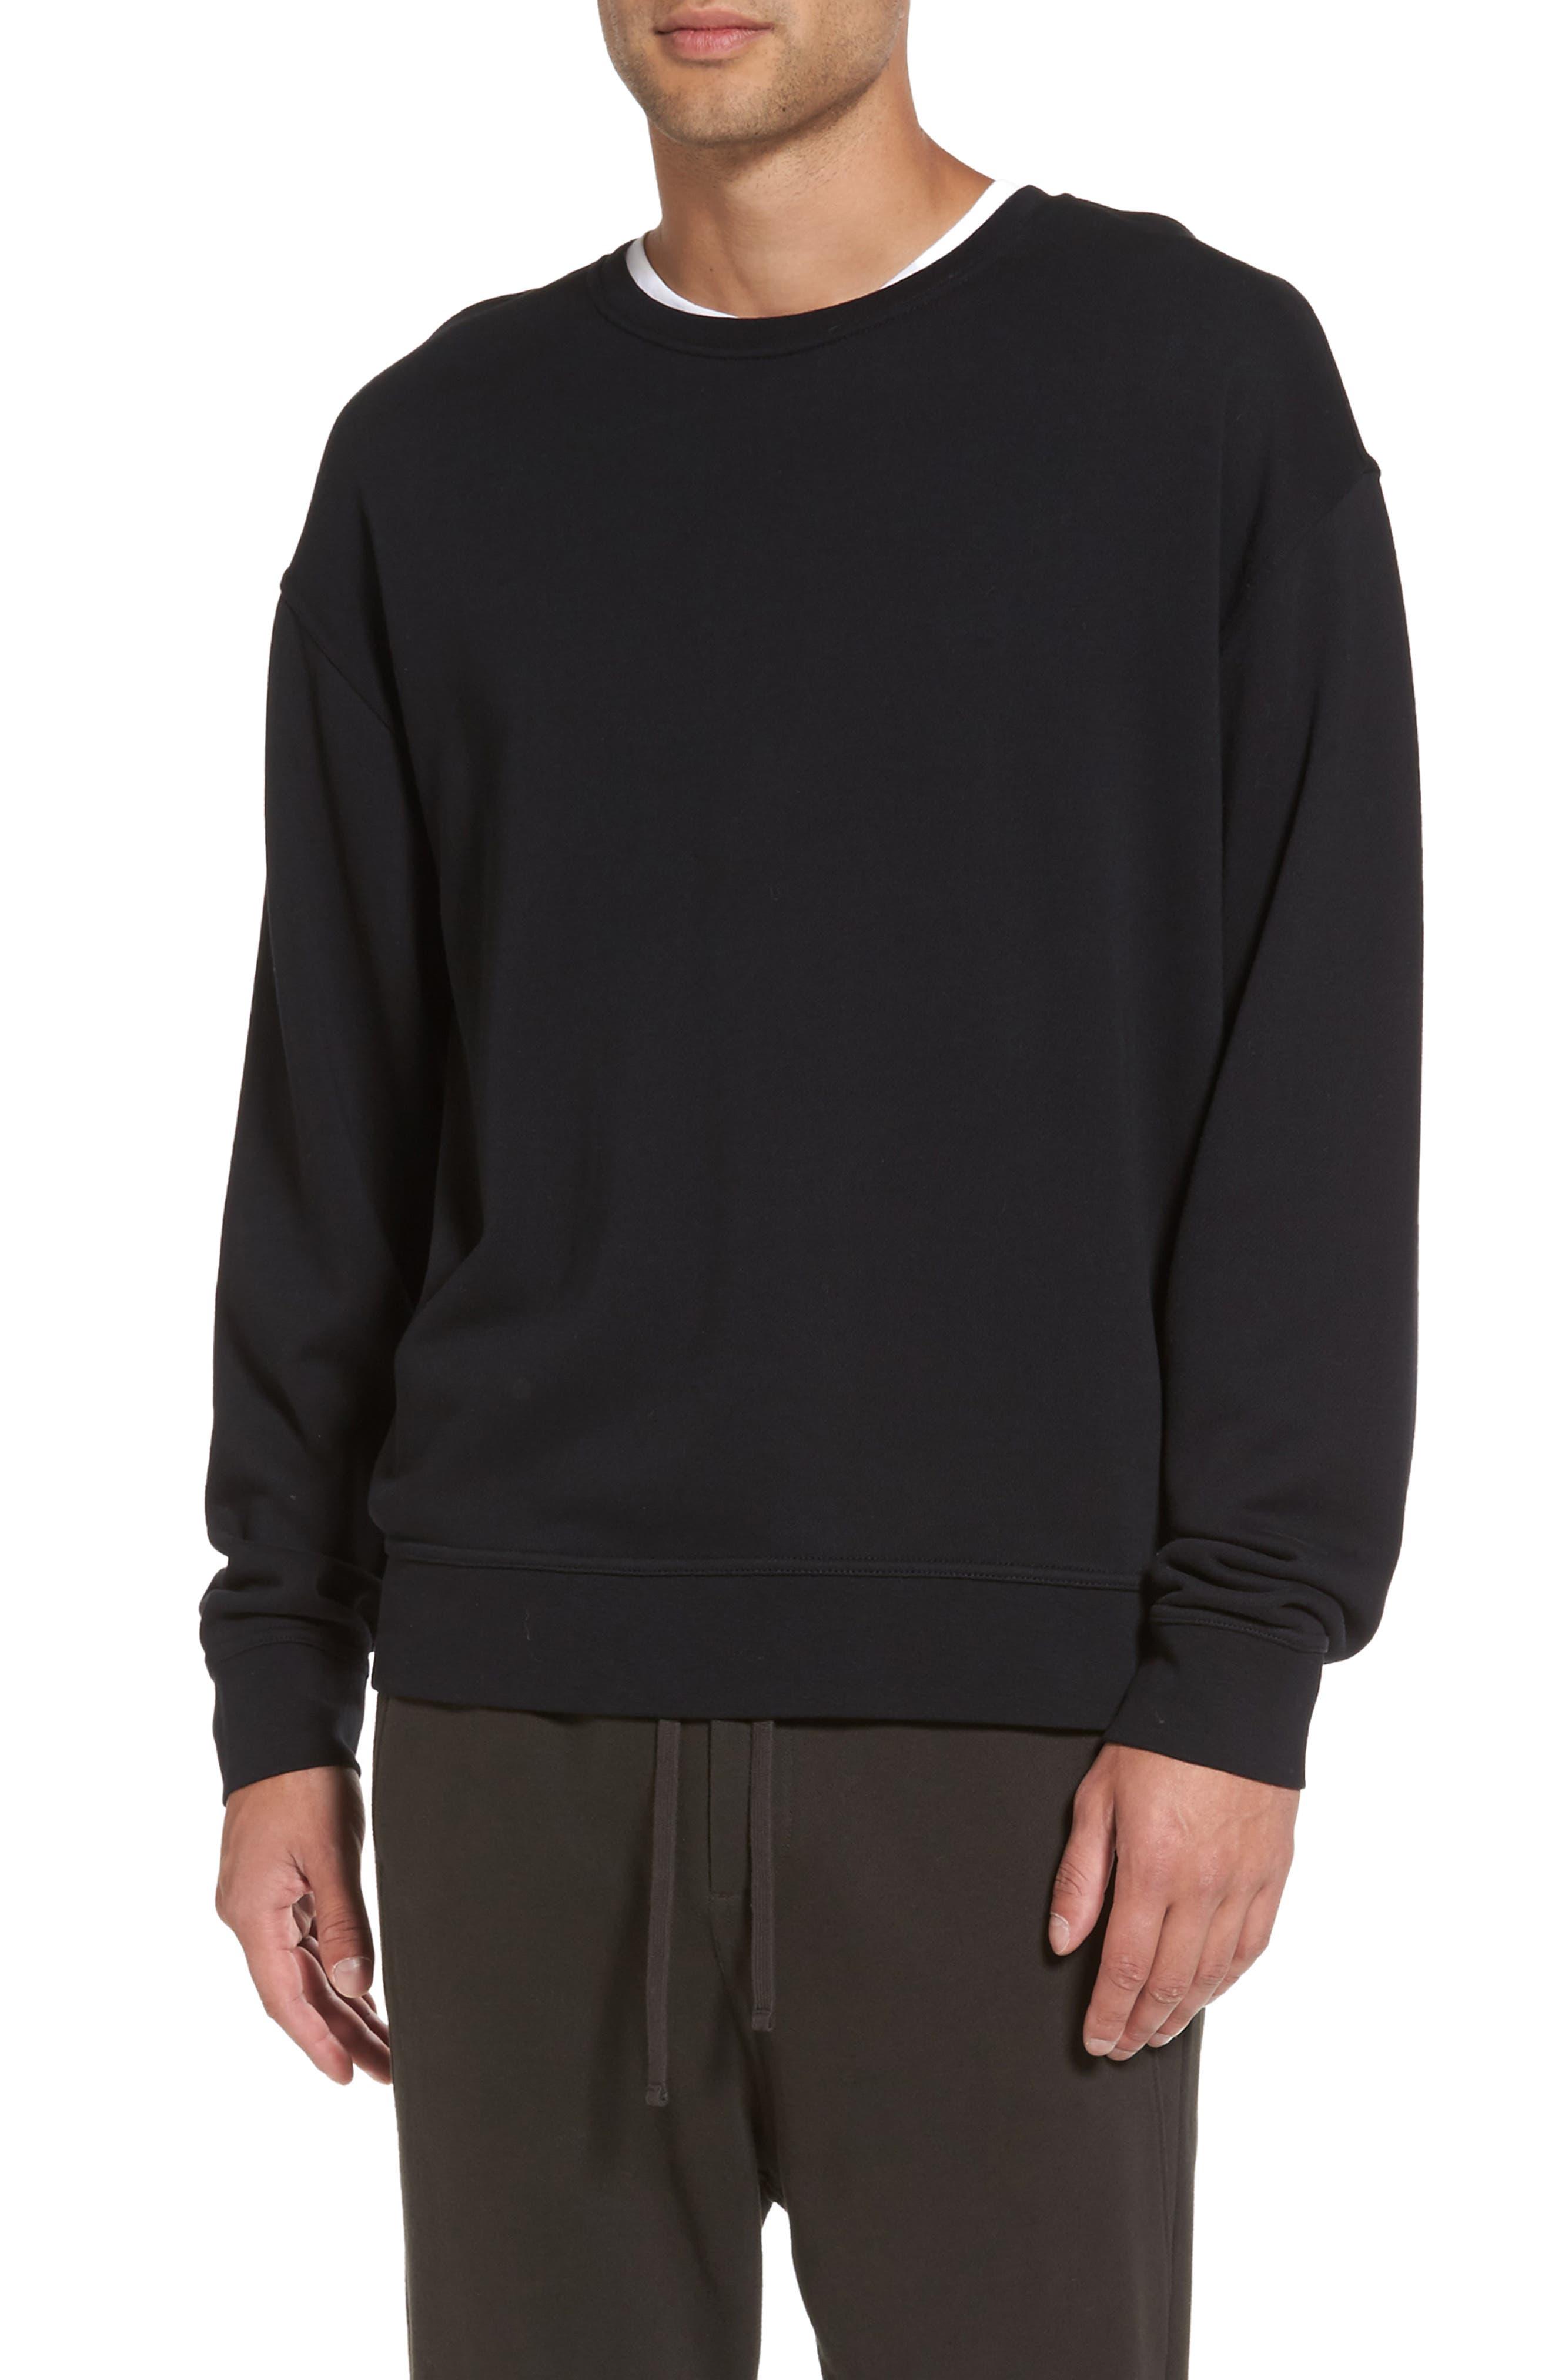 Main Image - Vince Crewneck Sweatshirt